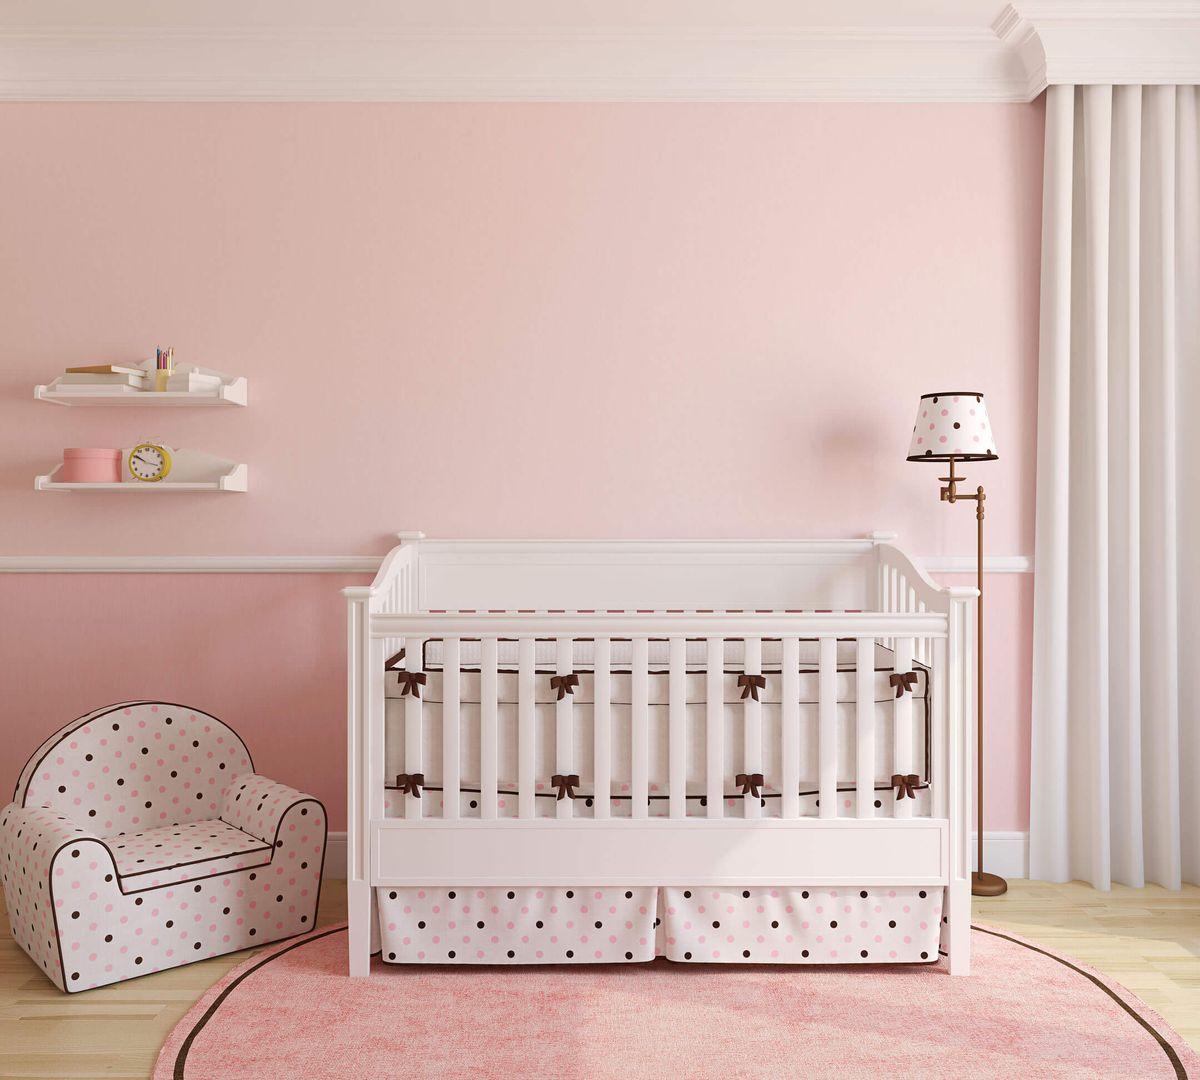 Interior-Painting-Ideas-for-Nurseries.jpg